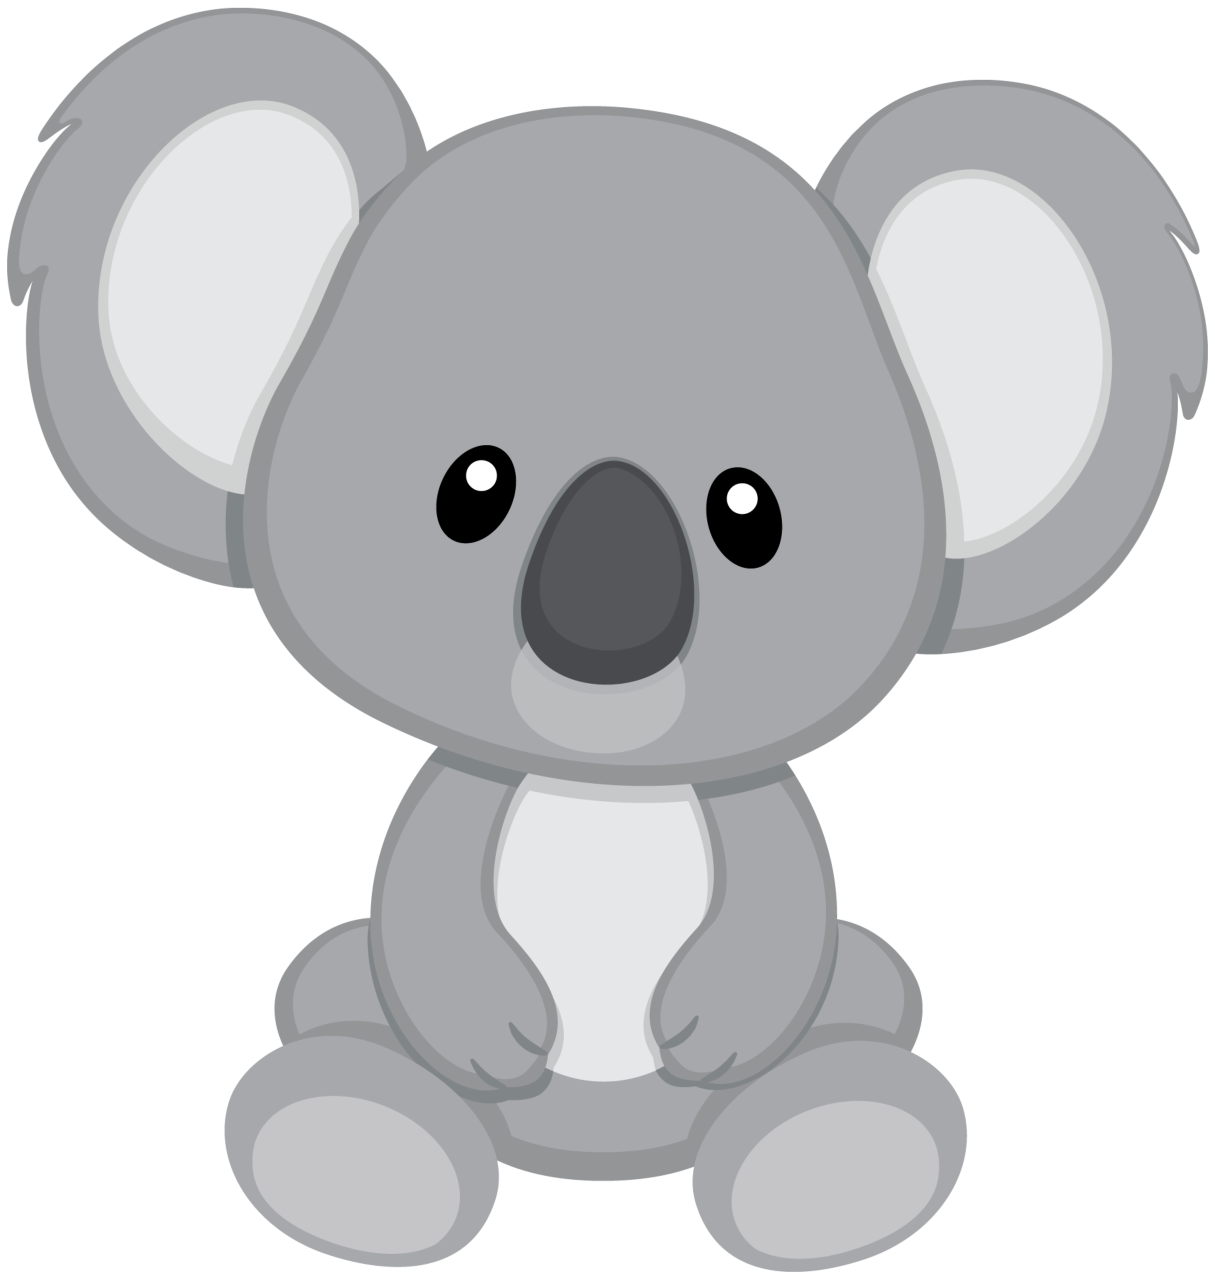 0 103df5 327dc506 orig 1215 1280 dibujo pinterest clip art rh br pinterest com Koala Bear Cartoon Koala Bear Cartoon